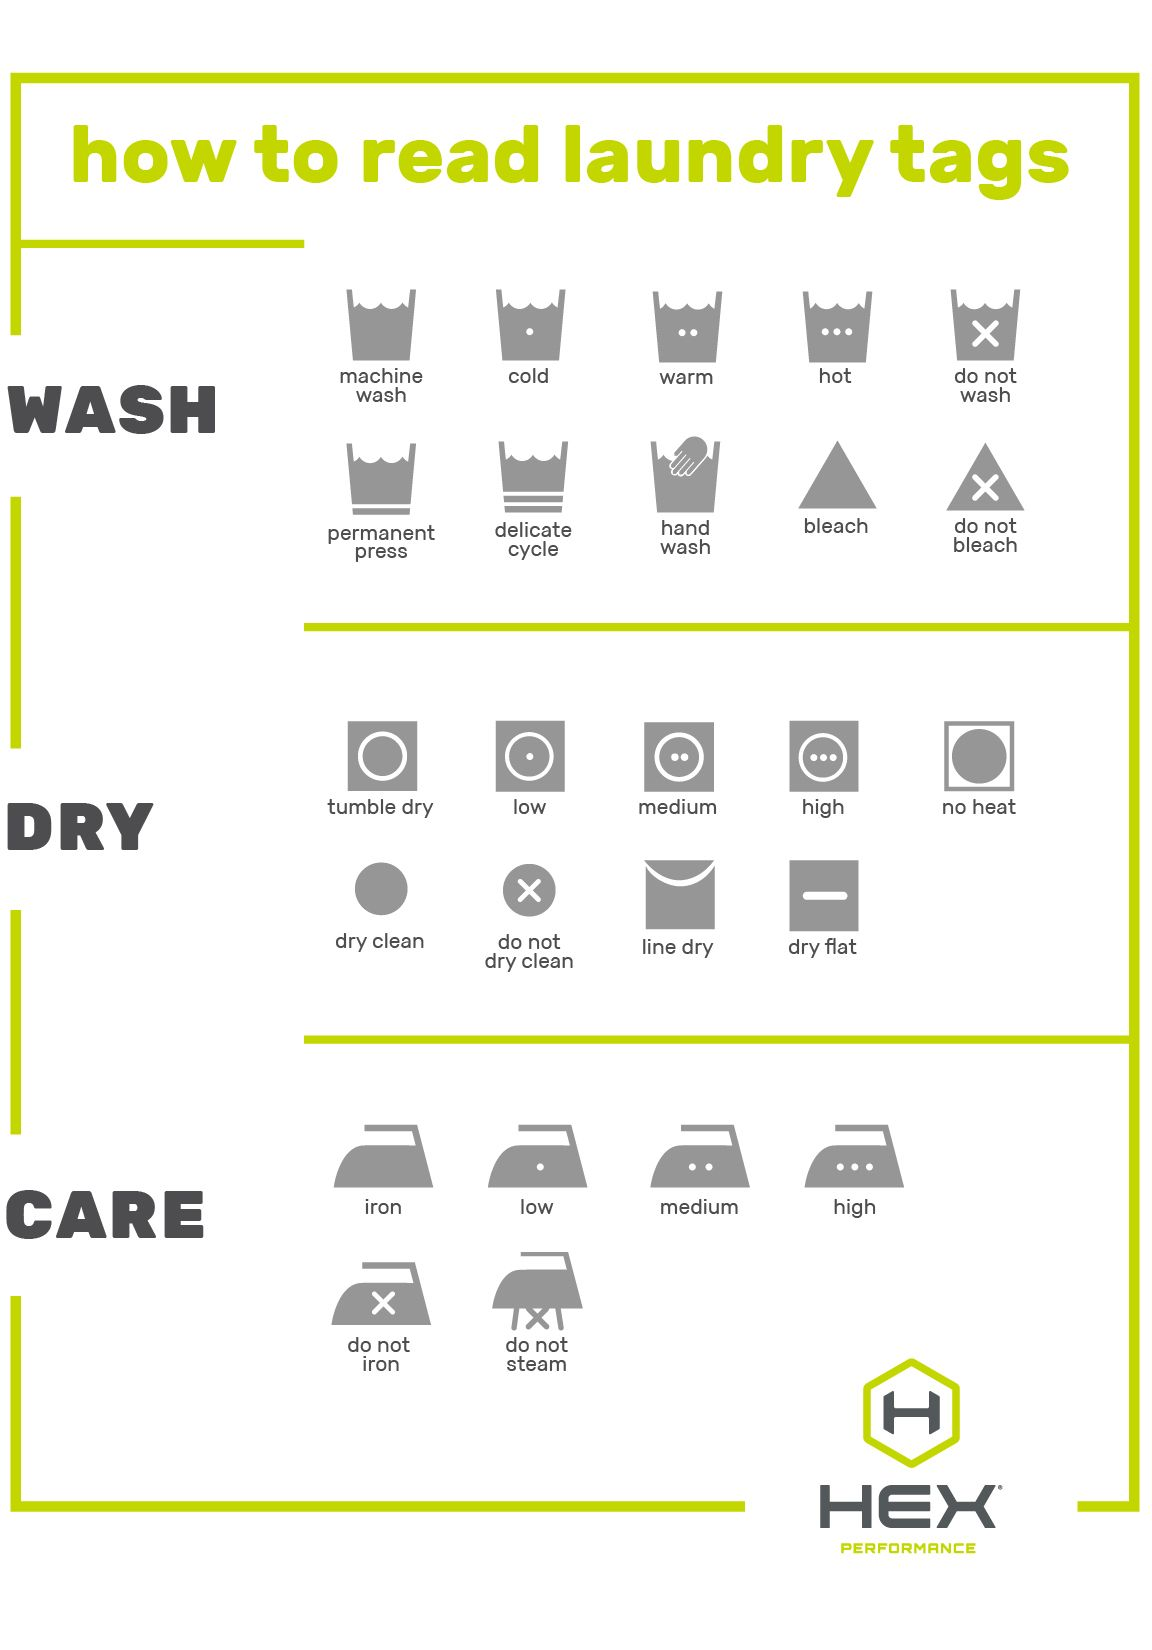 Laundry Tag Key Laundry Symbols Laundry Tags Laundry Detergent